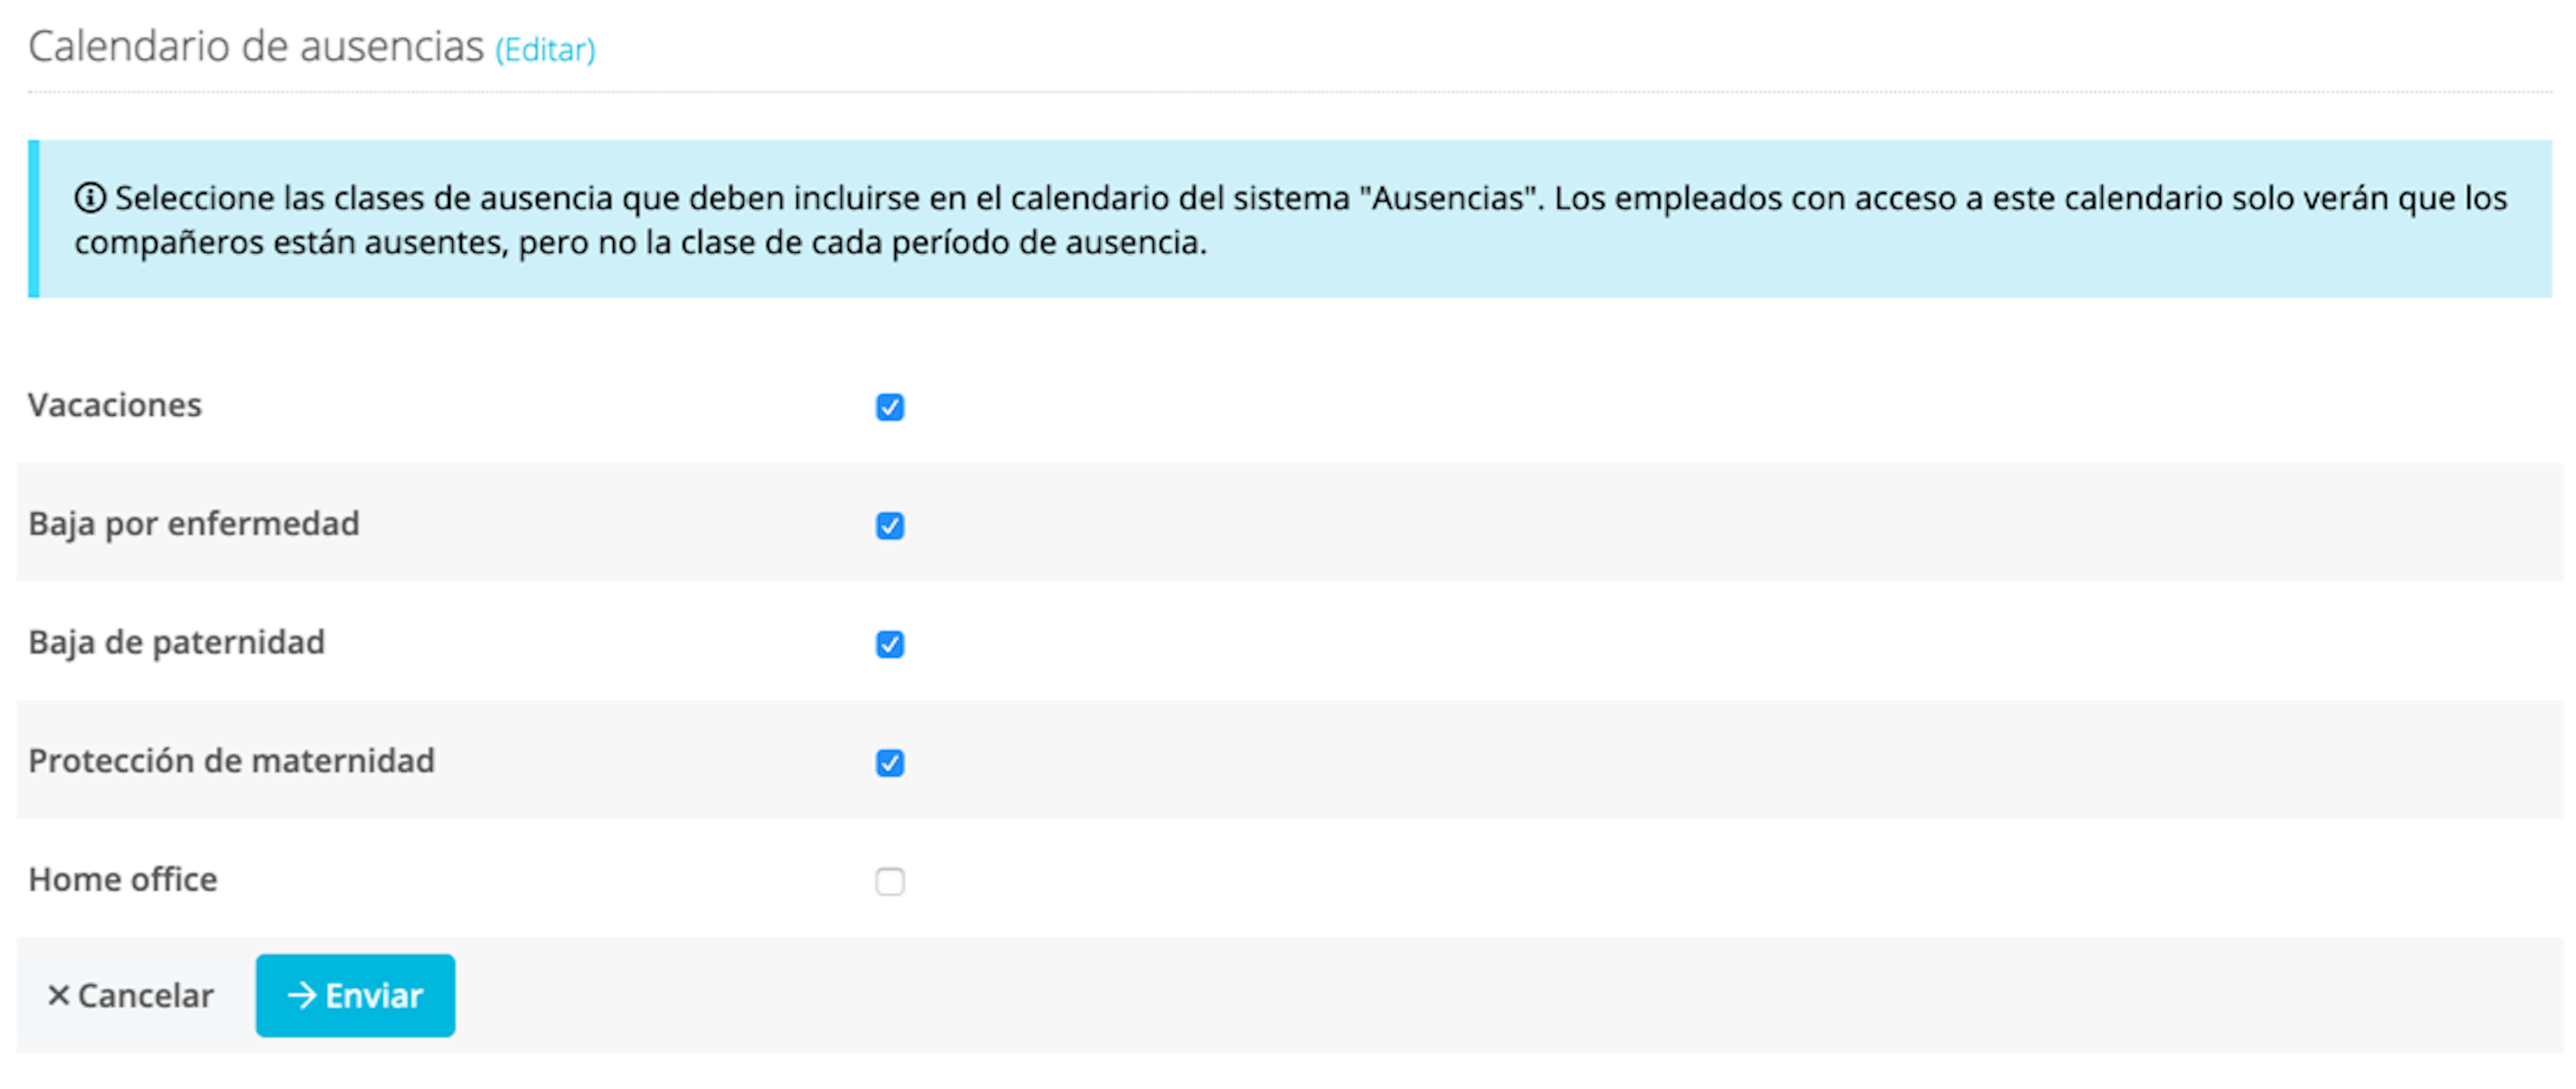 aggregated-absence-calendar-config_es.png